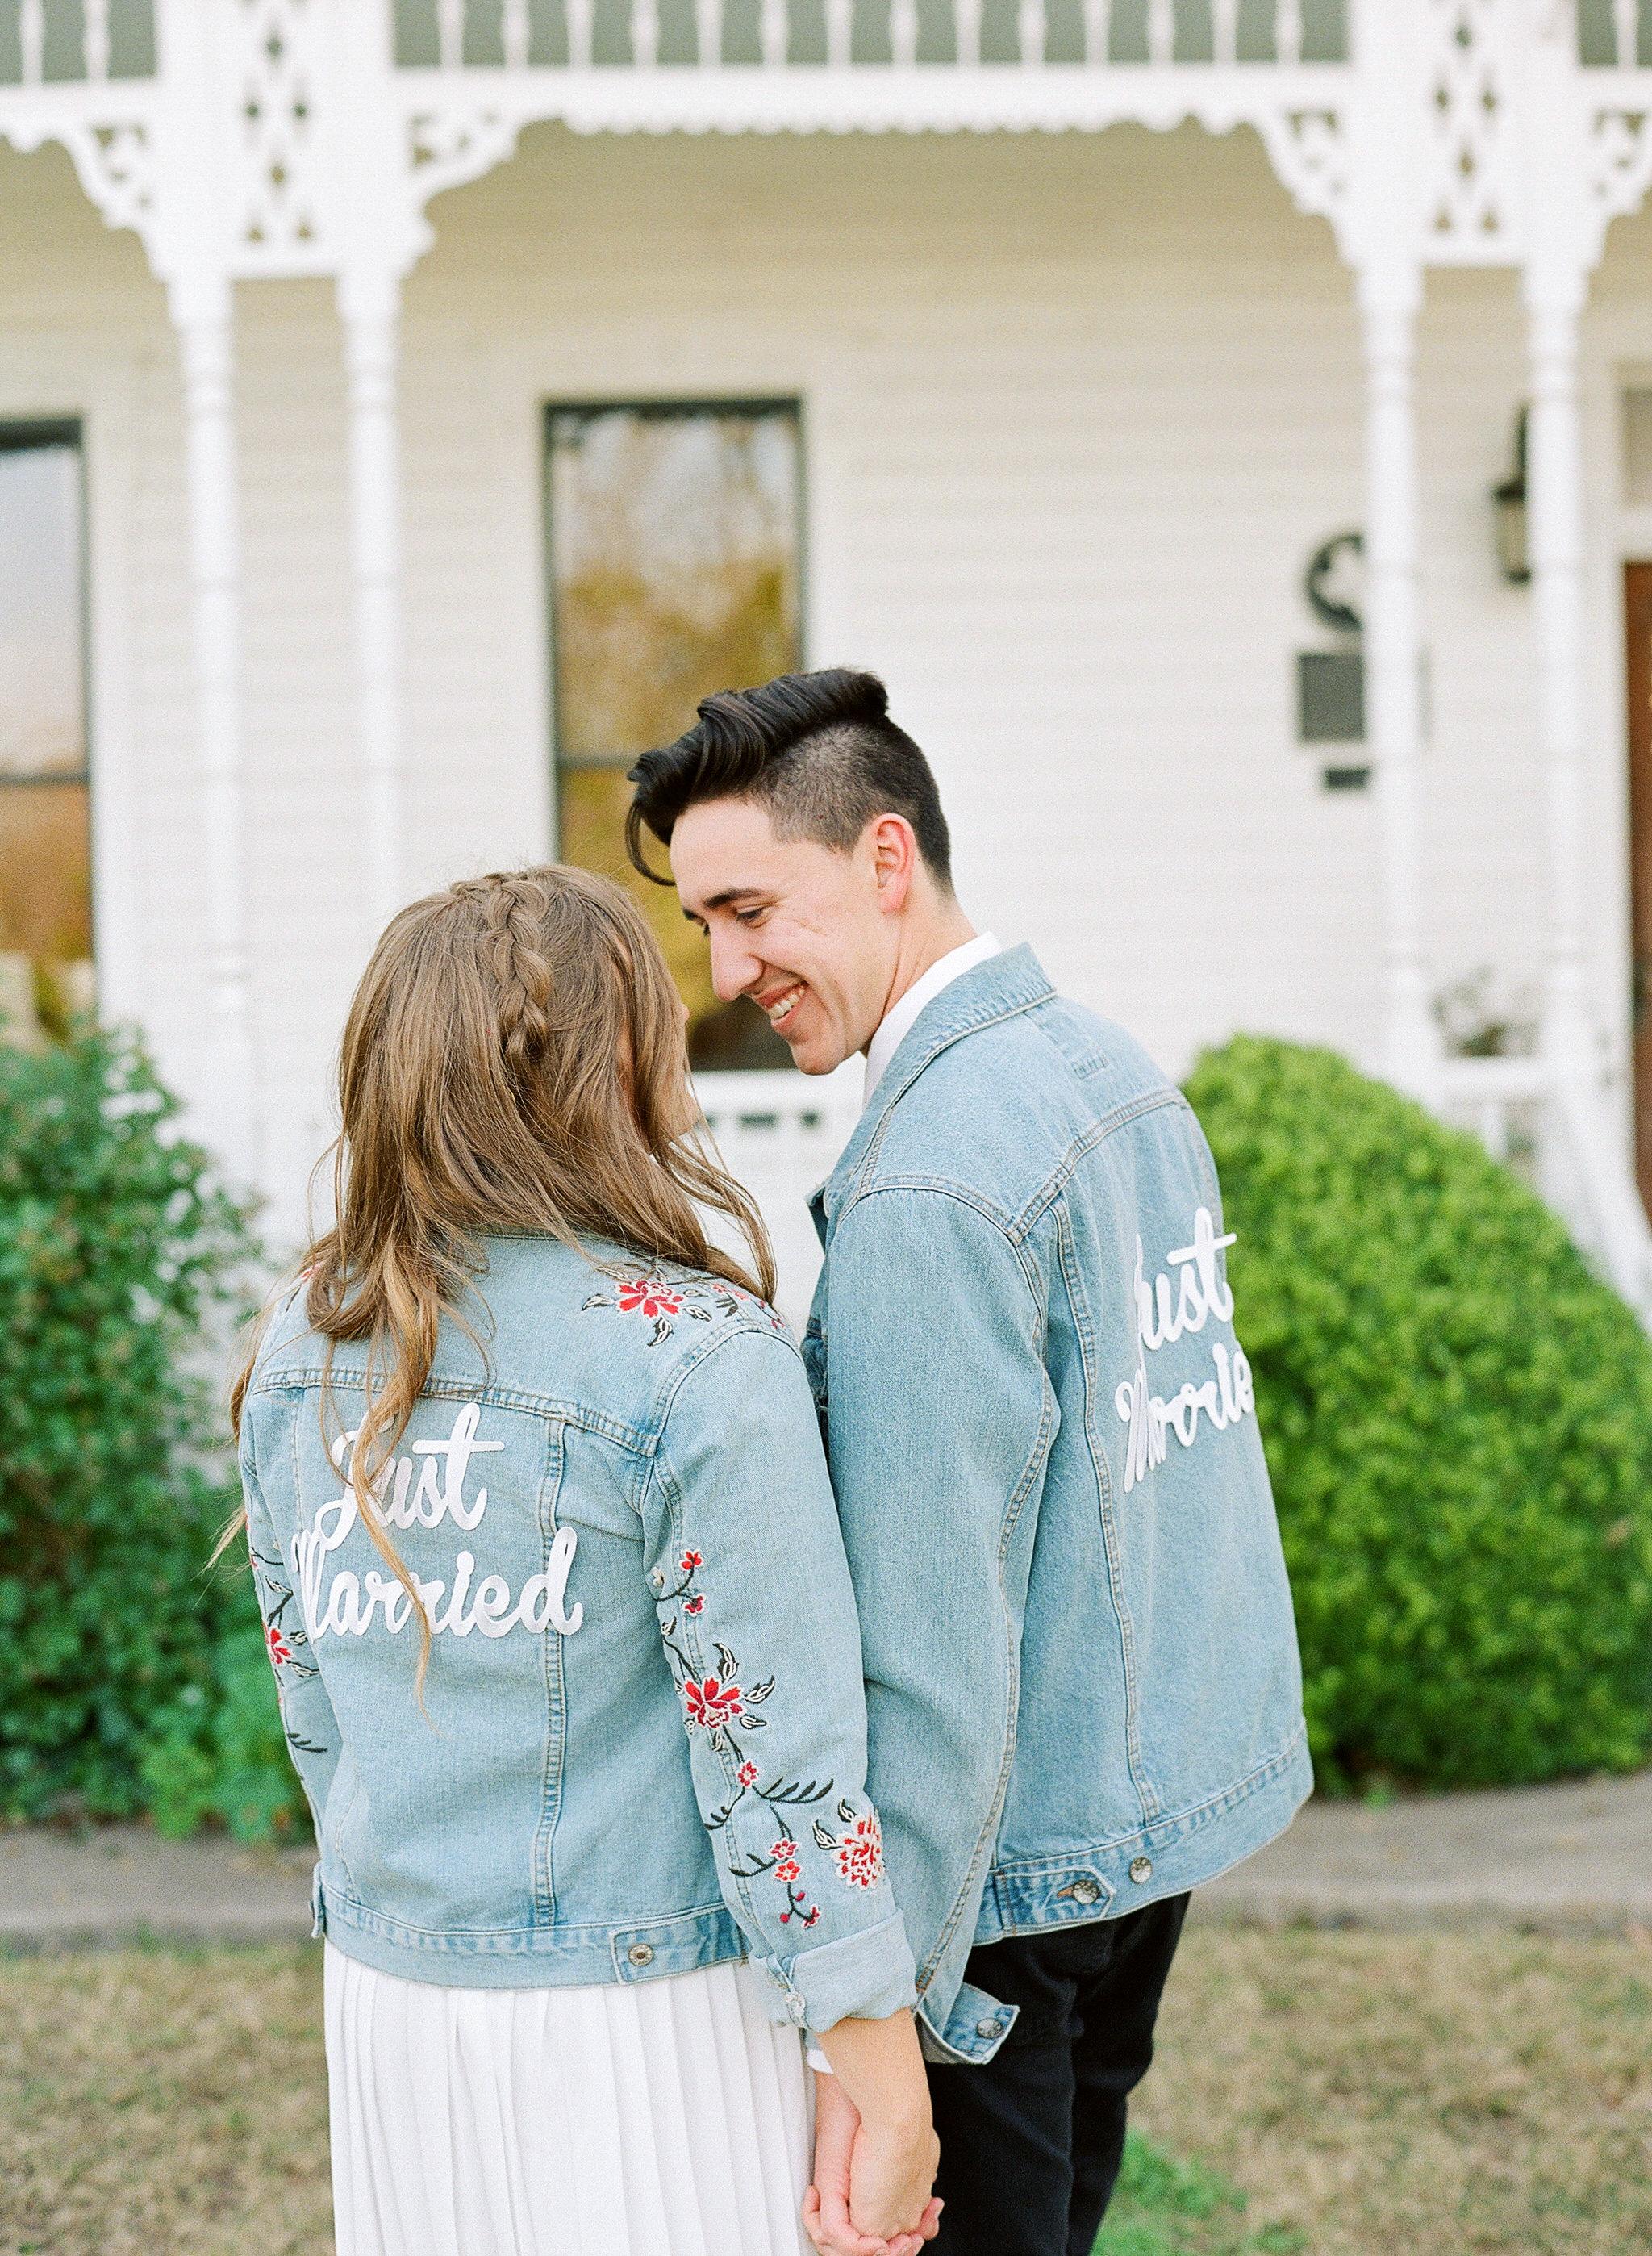 hayleigh corey wedding couple denim jackets